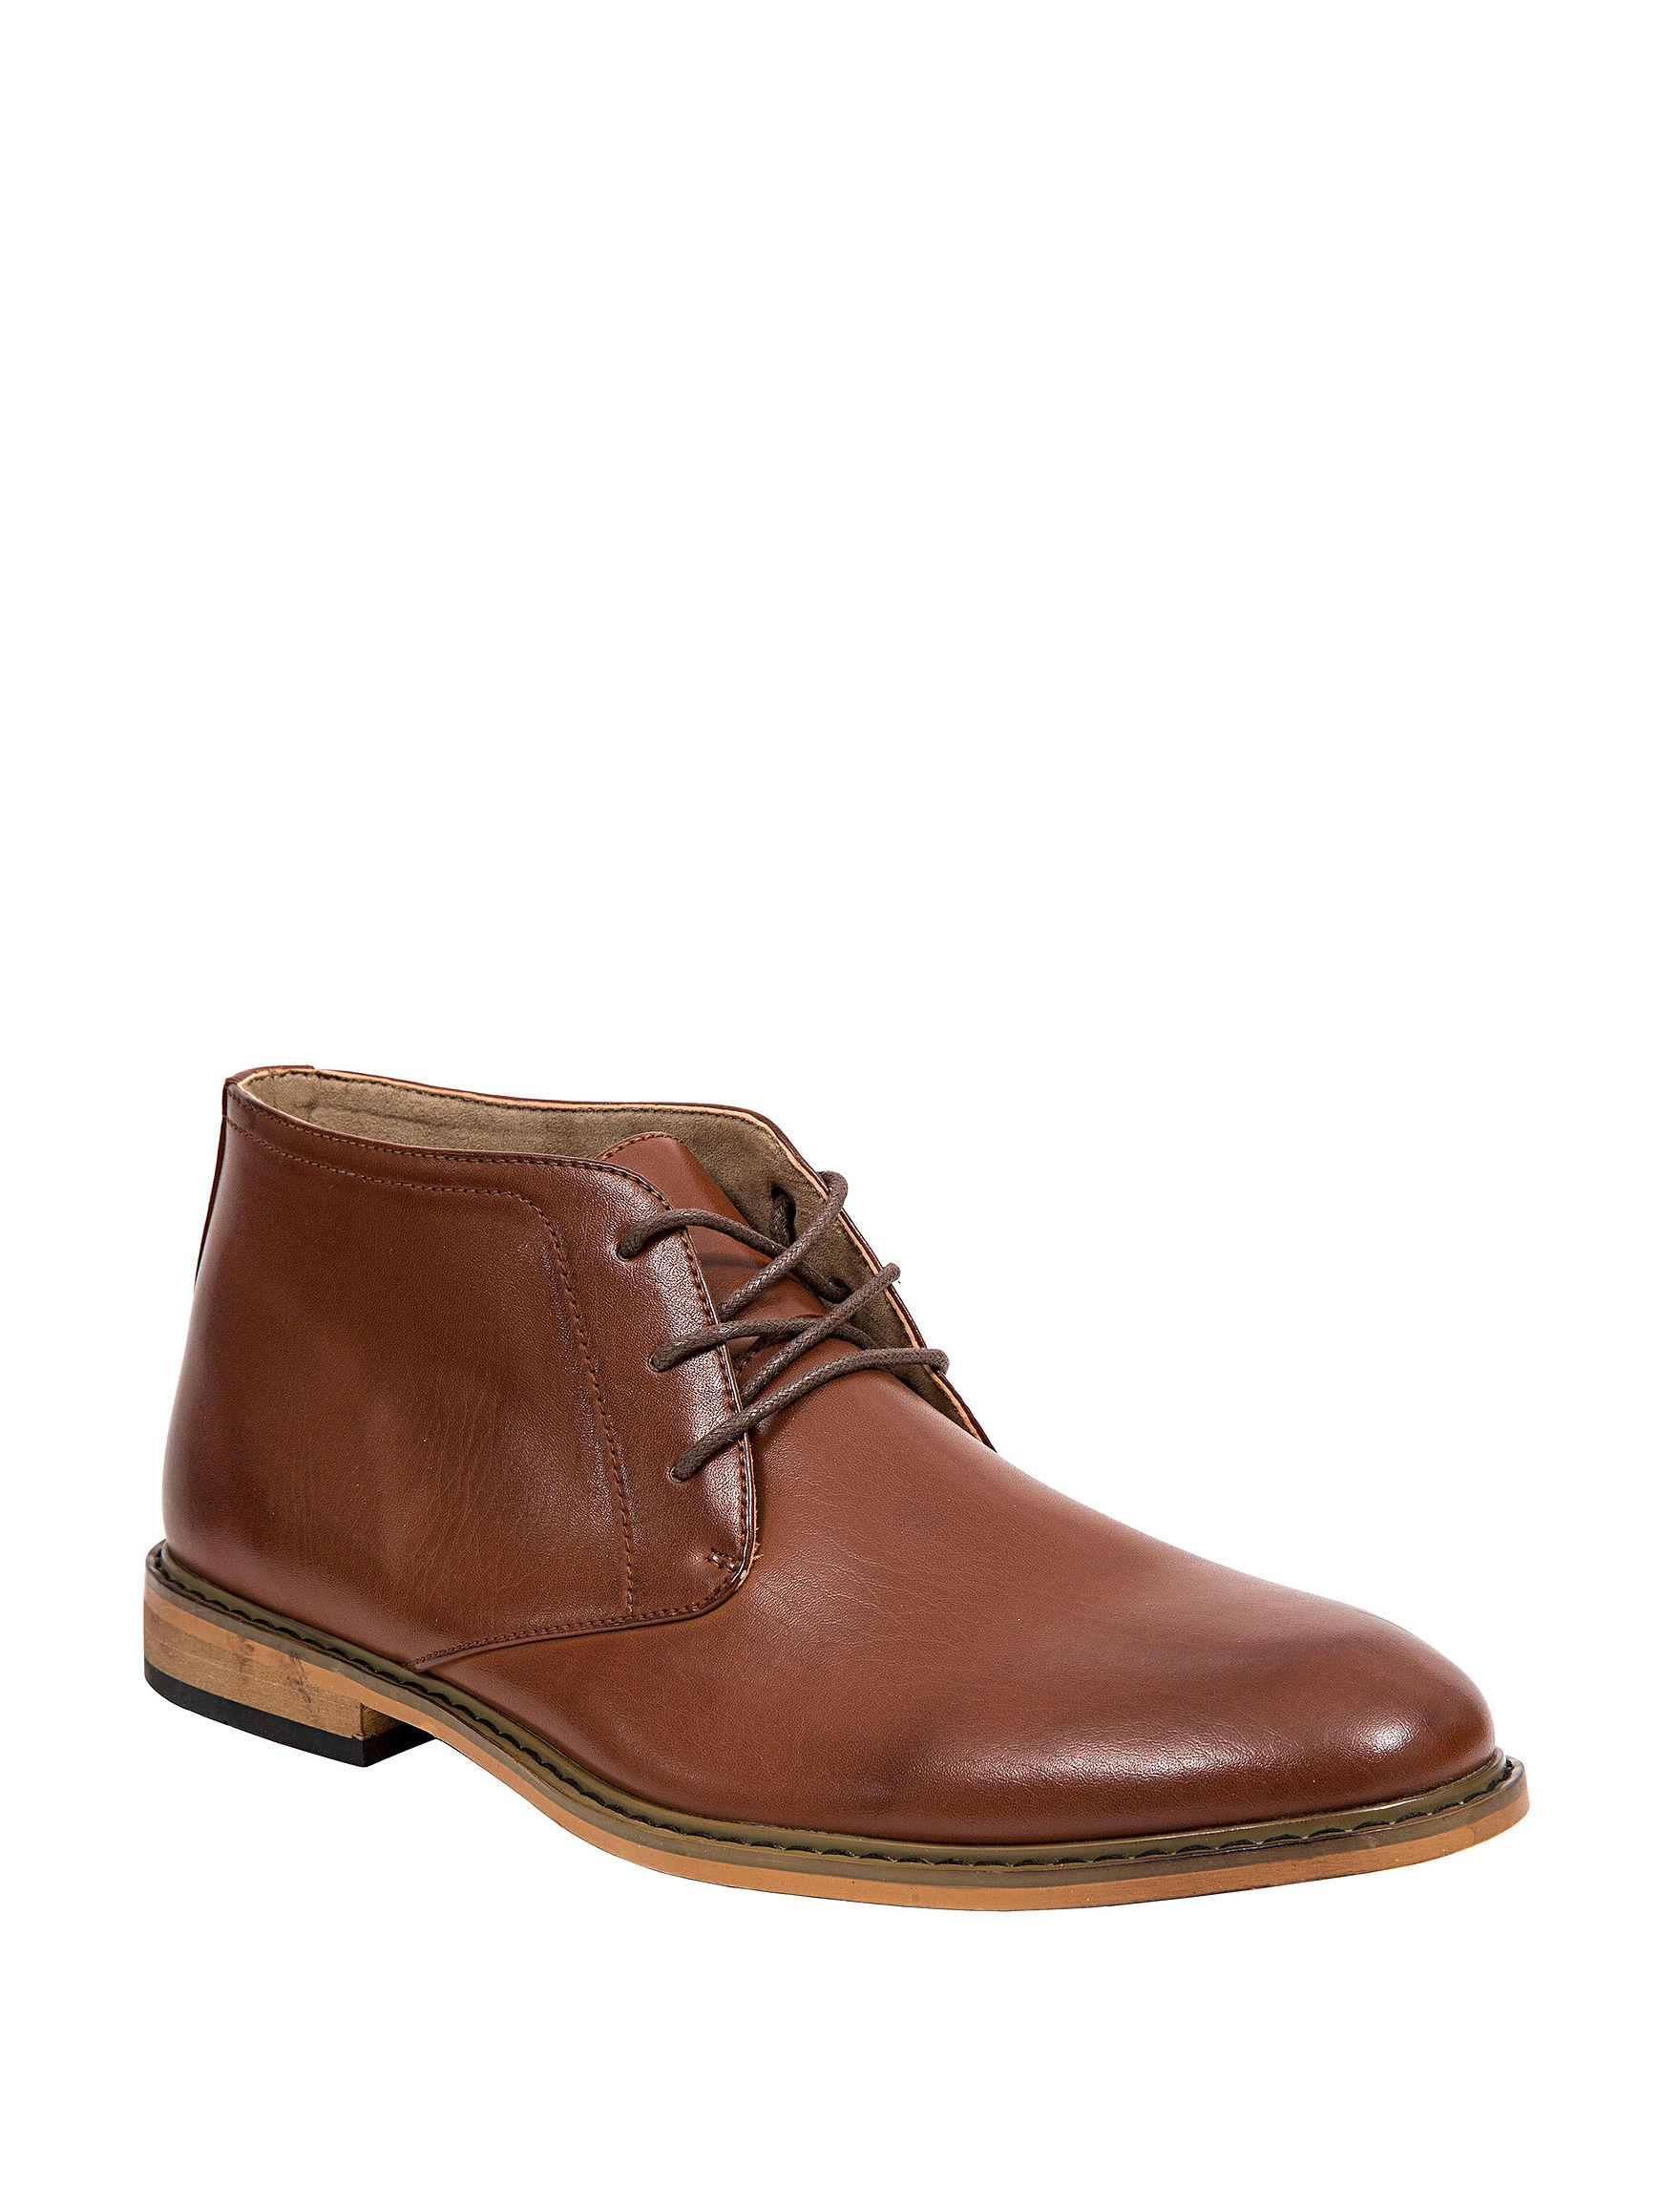 Deer Stags Brown Chukka Boots